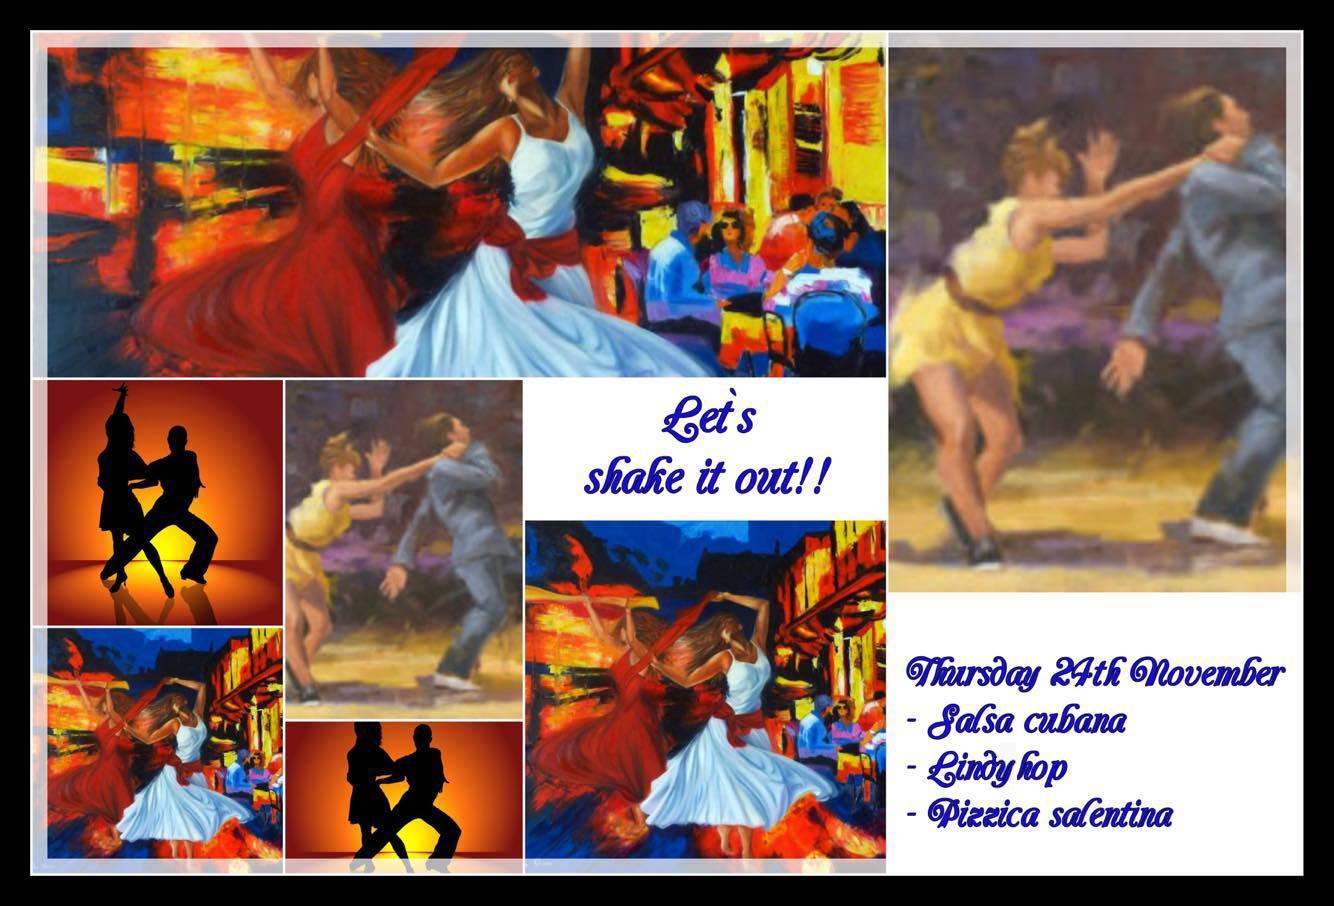 Shake it Out! Dance Night